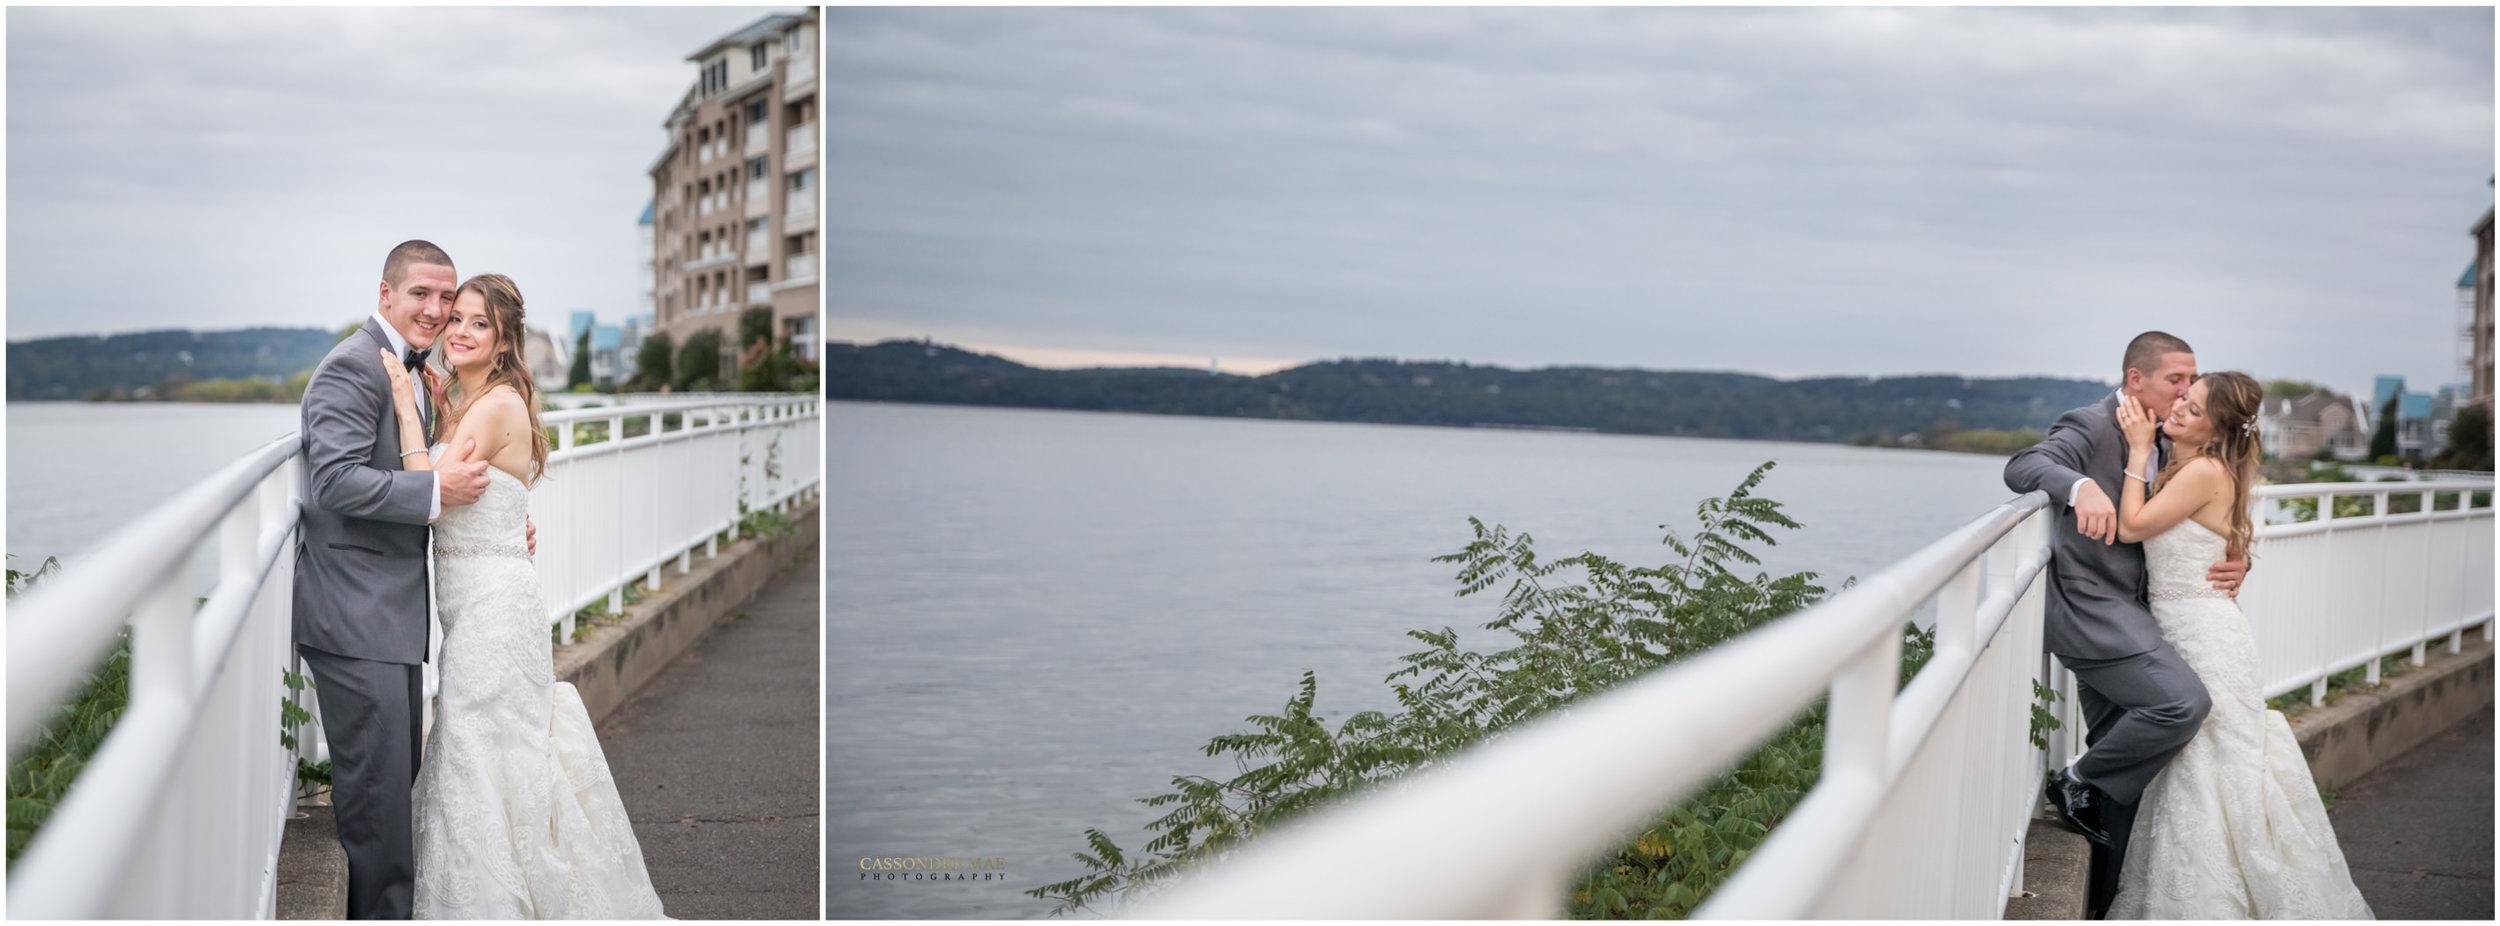 Views on the Hudson Wedding Photos Cassondre Mae Photography 29.jpg